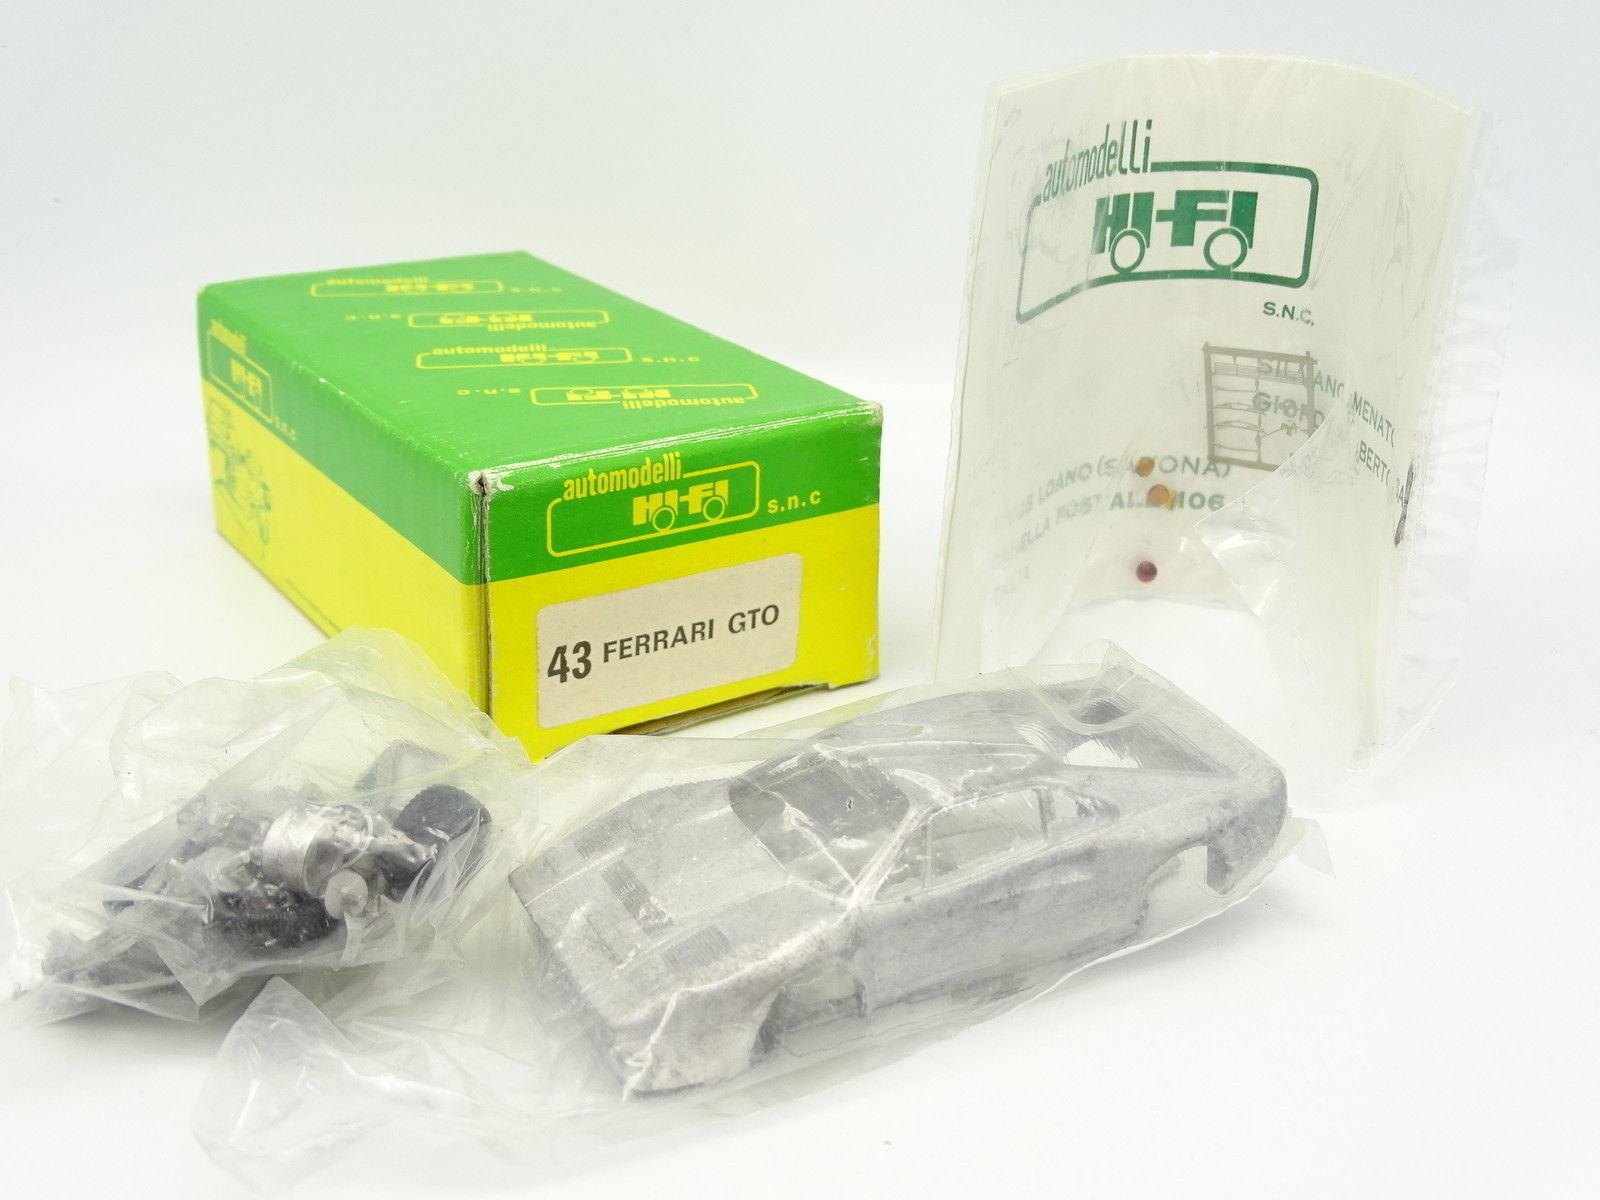 Hifi Kit para Montar 1 43 - Ferrari 288 Gto